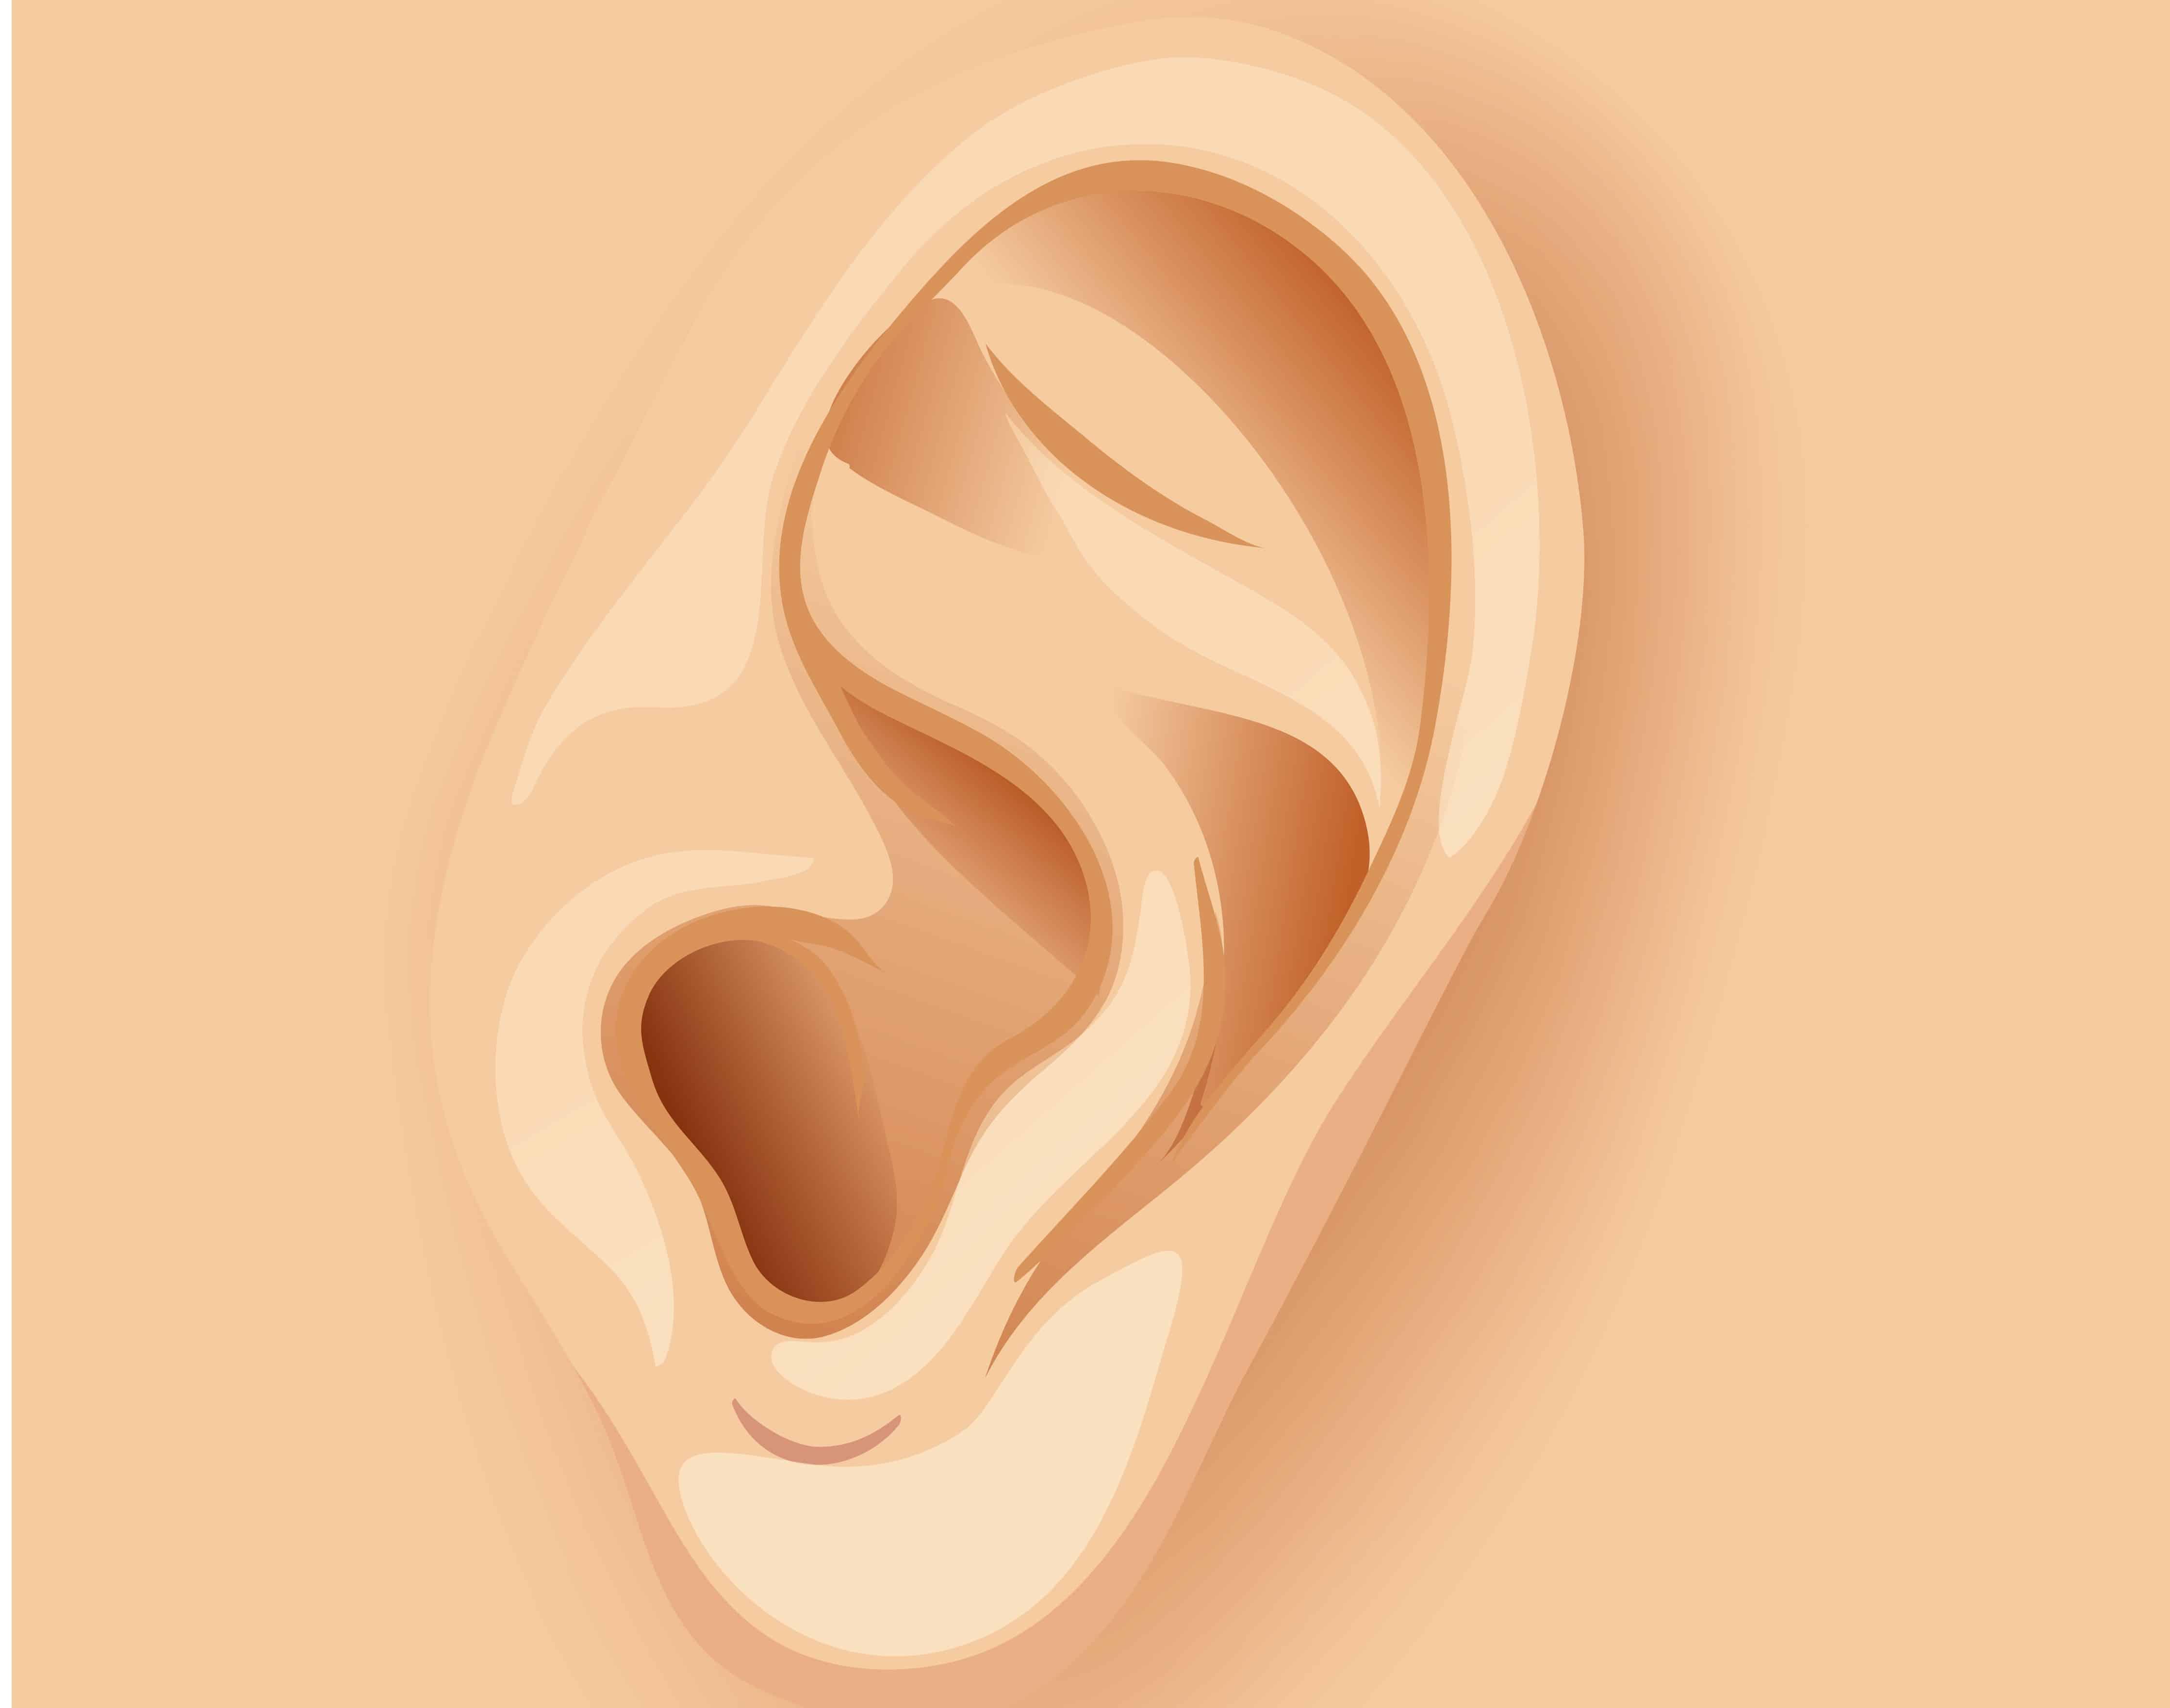 Ouvido e orelha